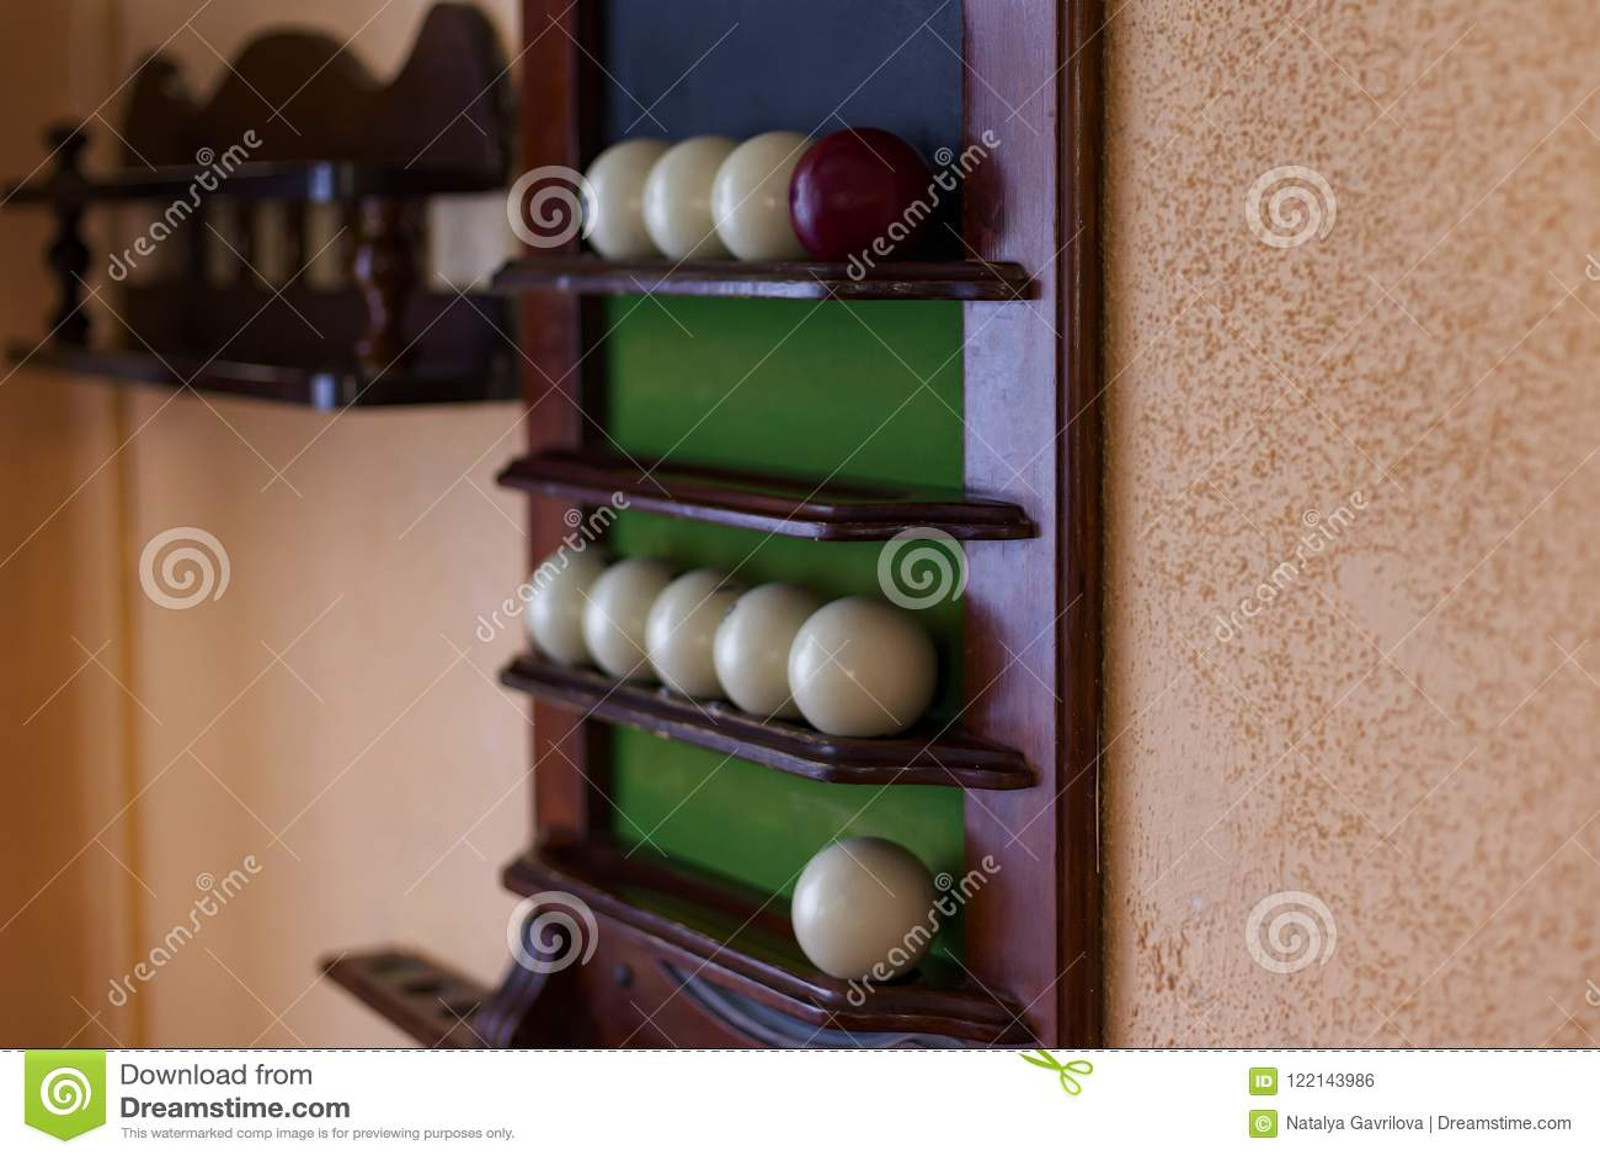 Billiard balls on a Board on the wall